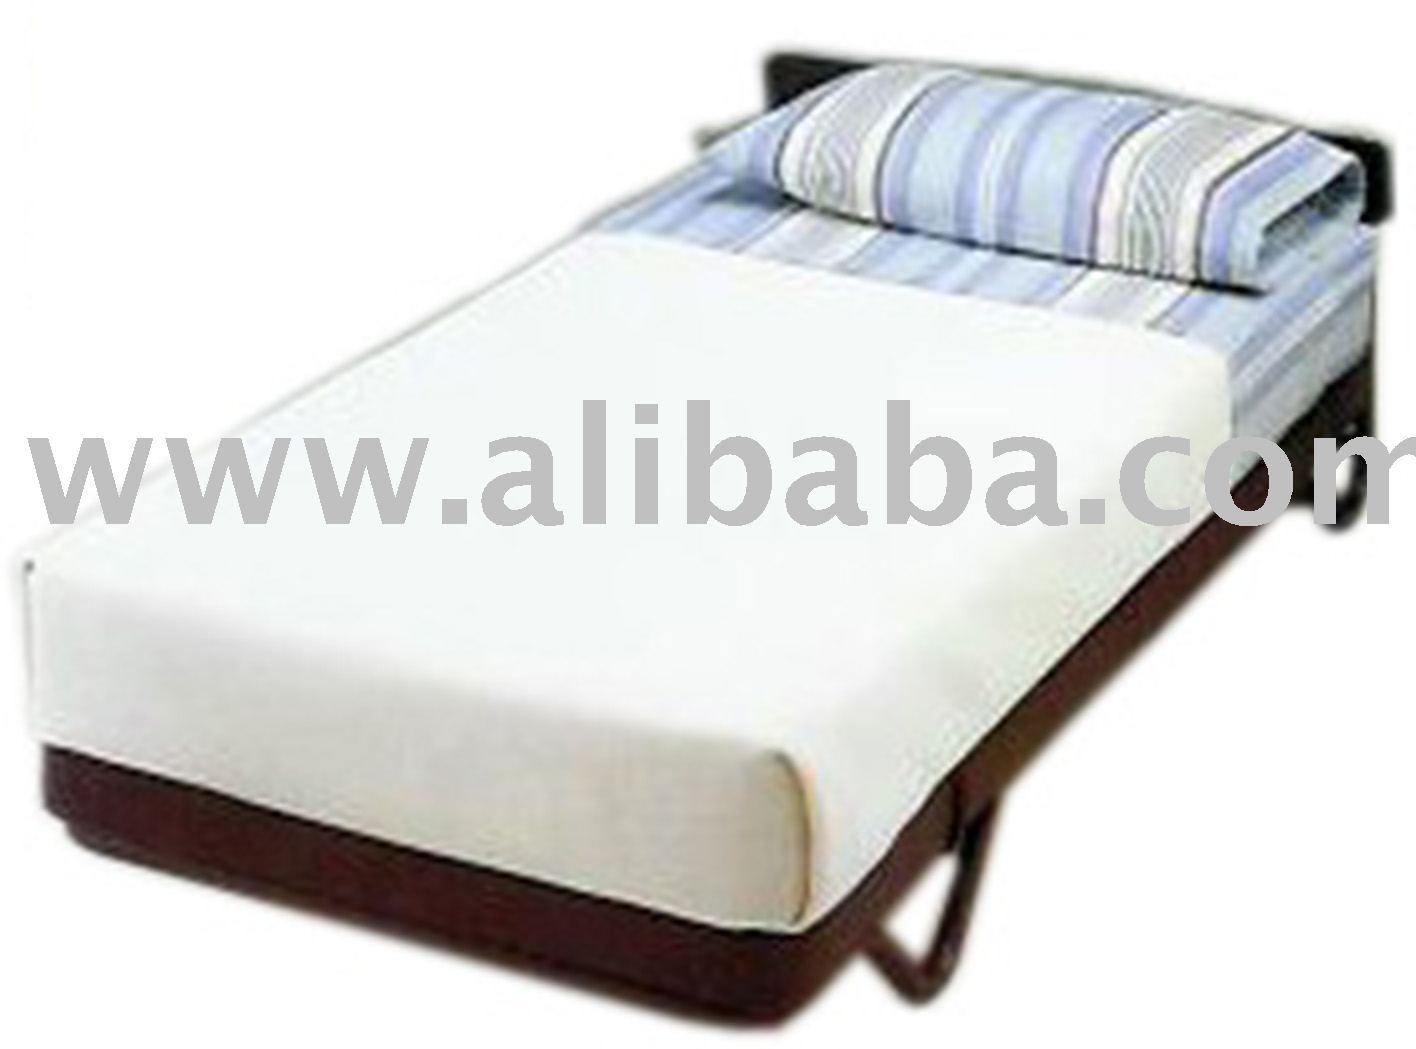 Hotel Housekeeping Rollaway Bed Photo Detailed About Hotel Housekeeping Rollaway Bed Picture On